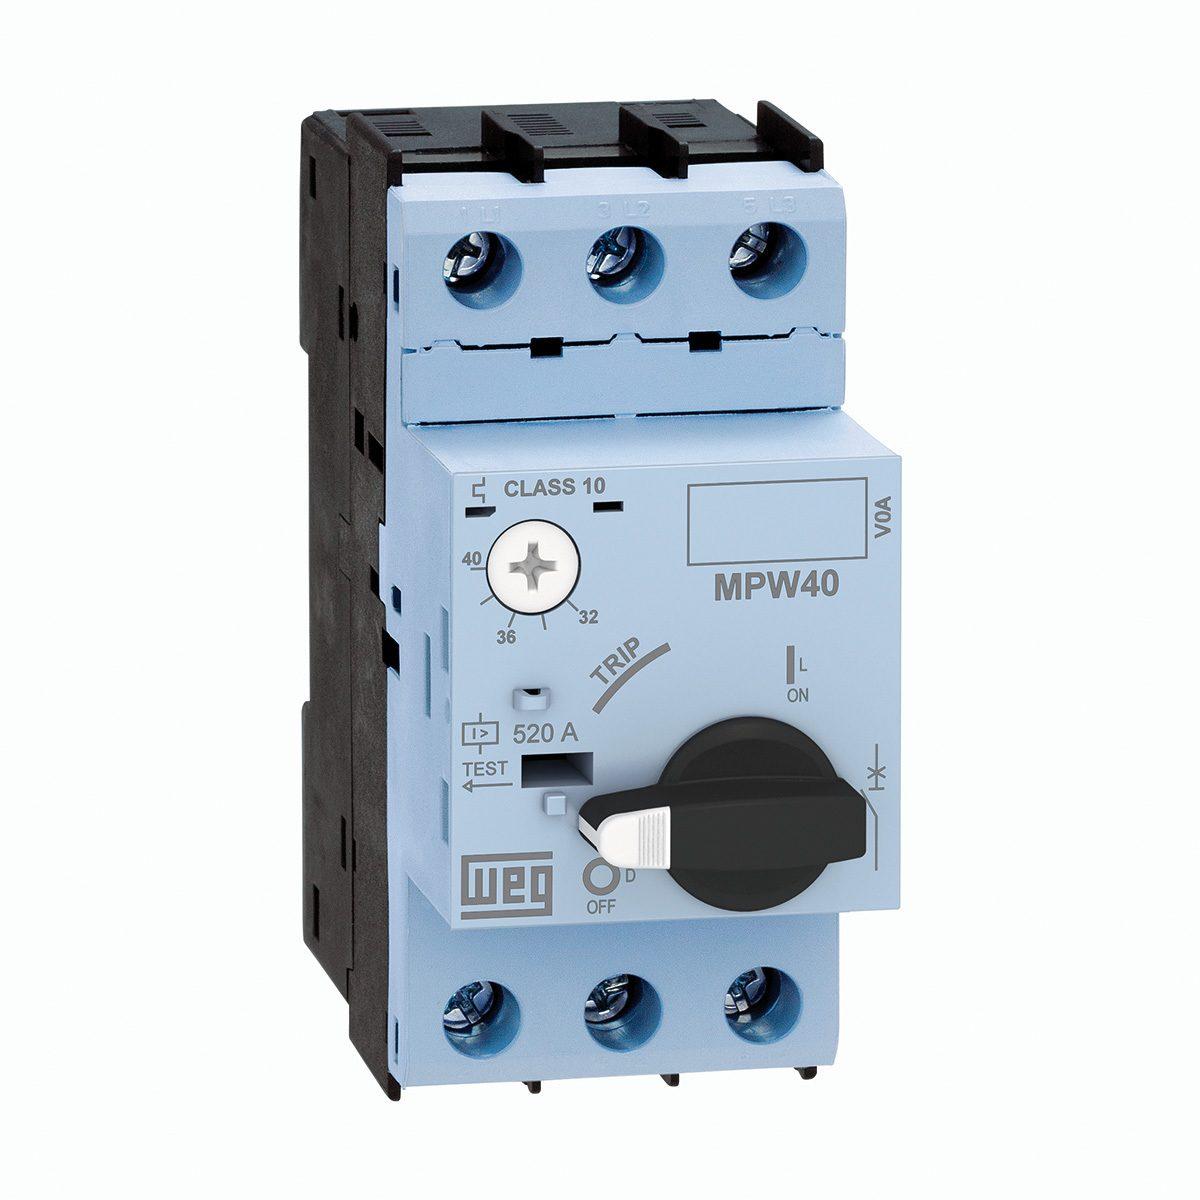 Disjuntor Motor Weg Az Mpw40-3-U025 20-25a